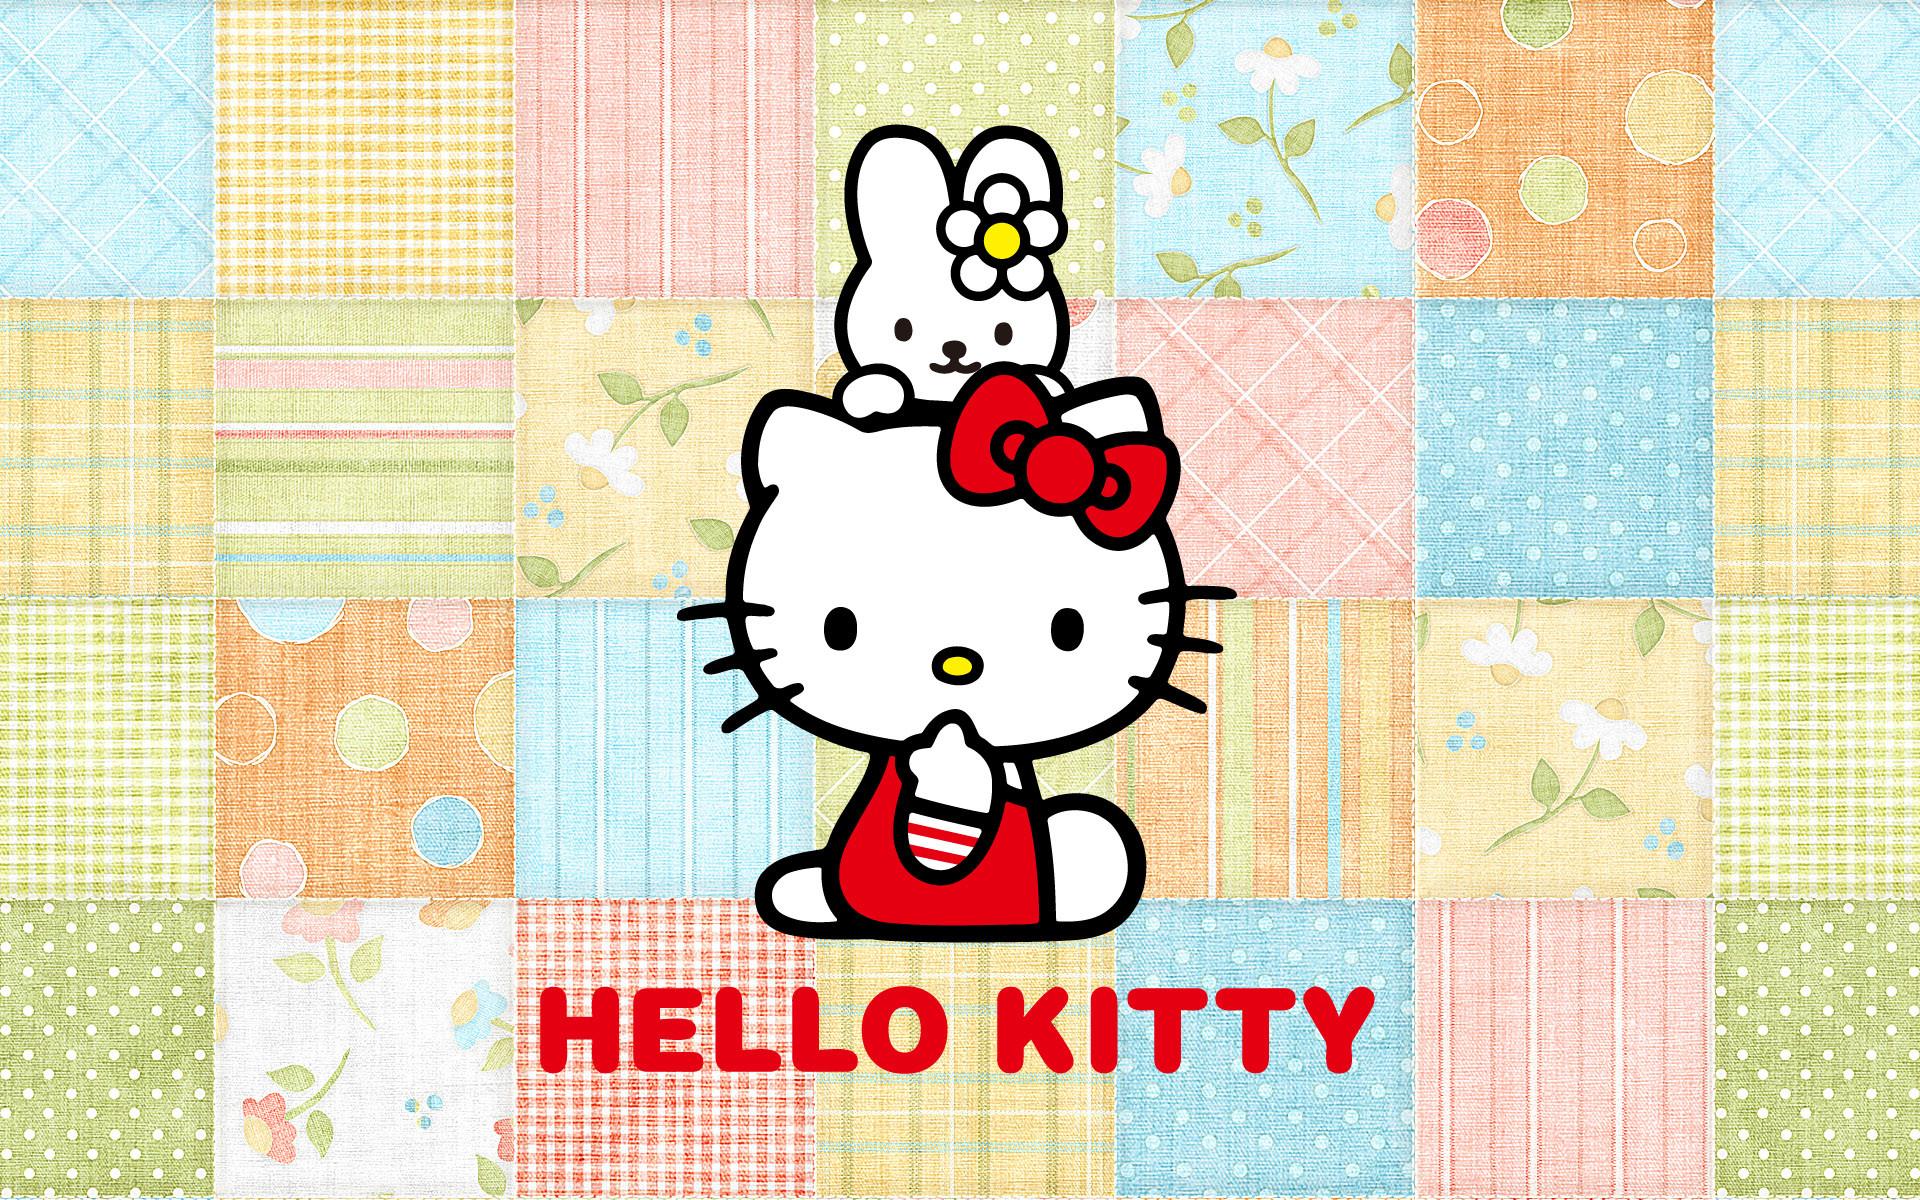 Cute Hello Kitty Wallpaper Hello kitty de…